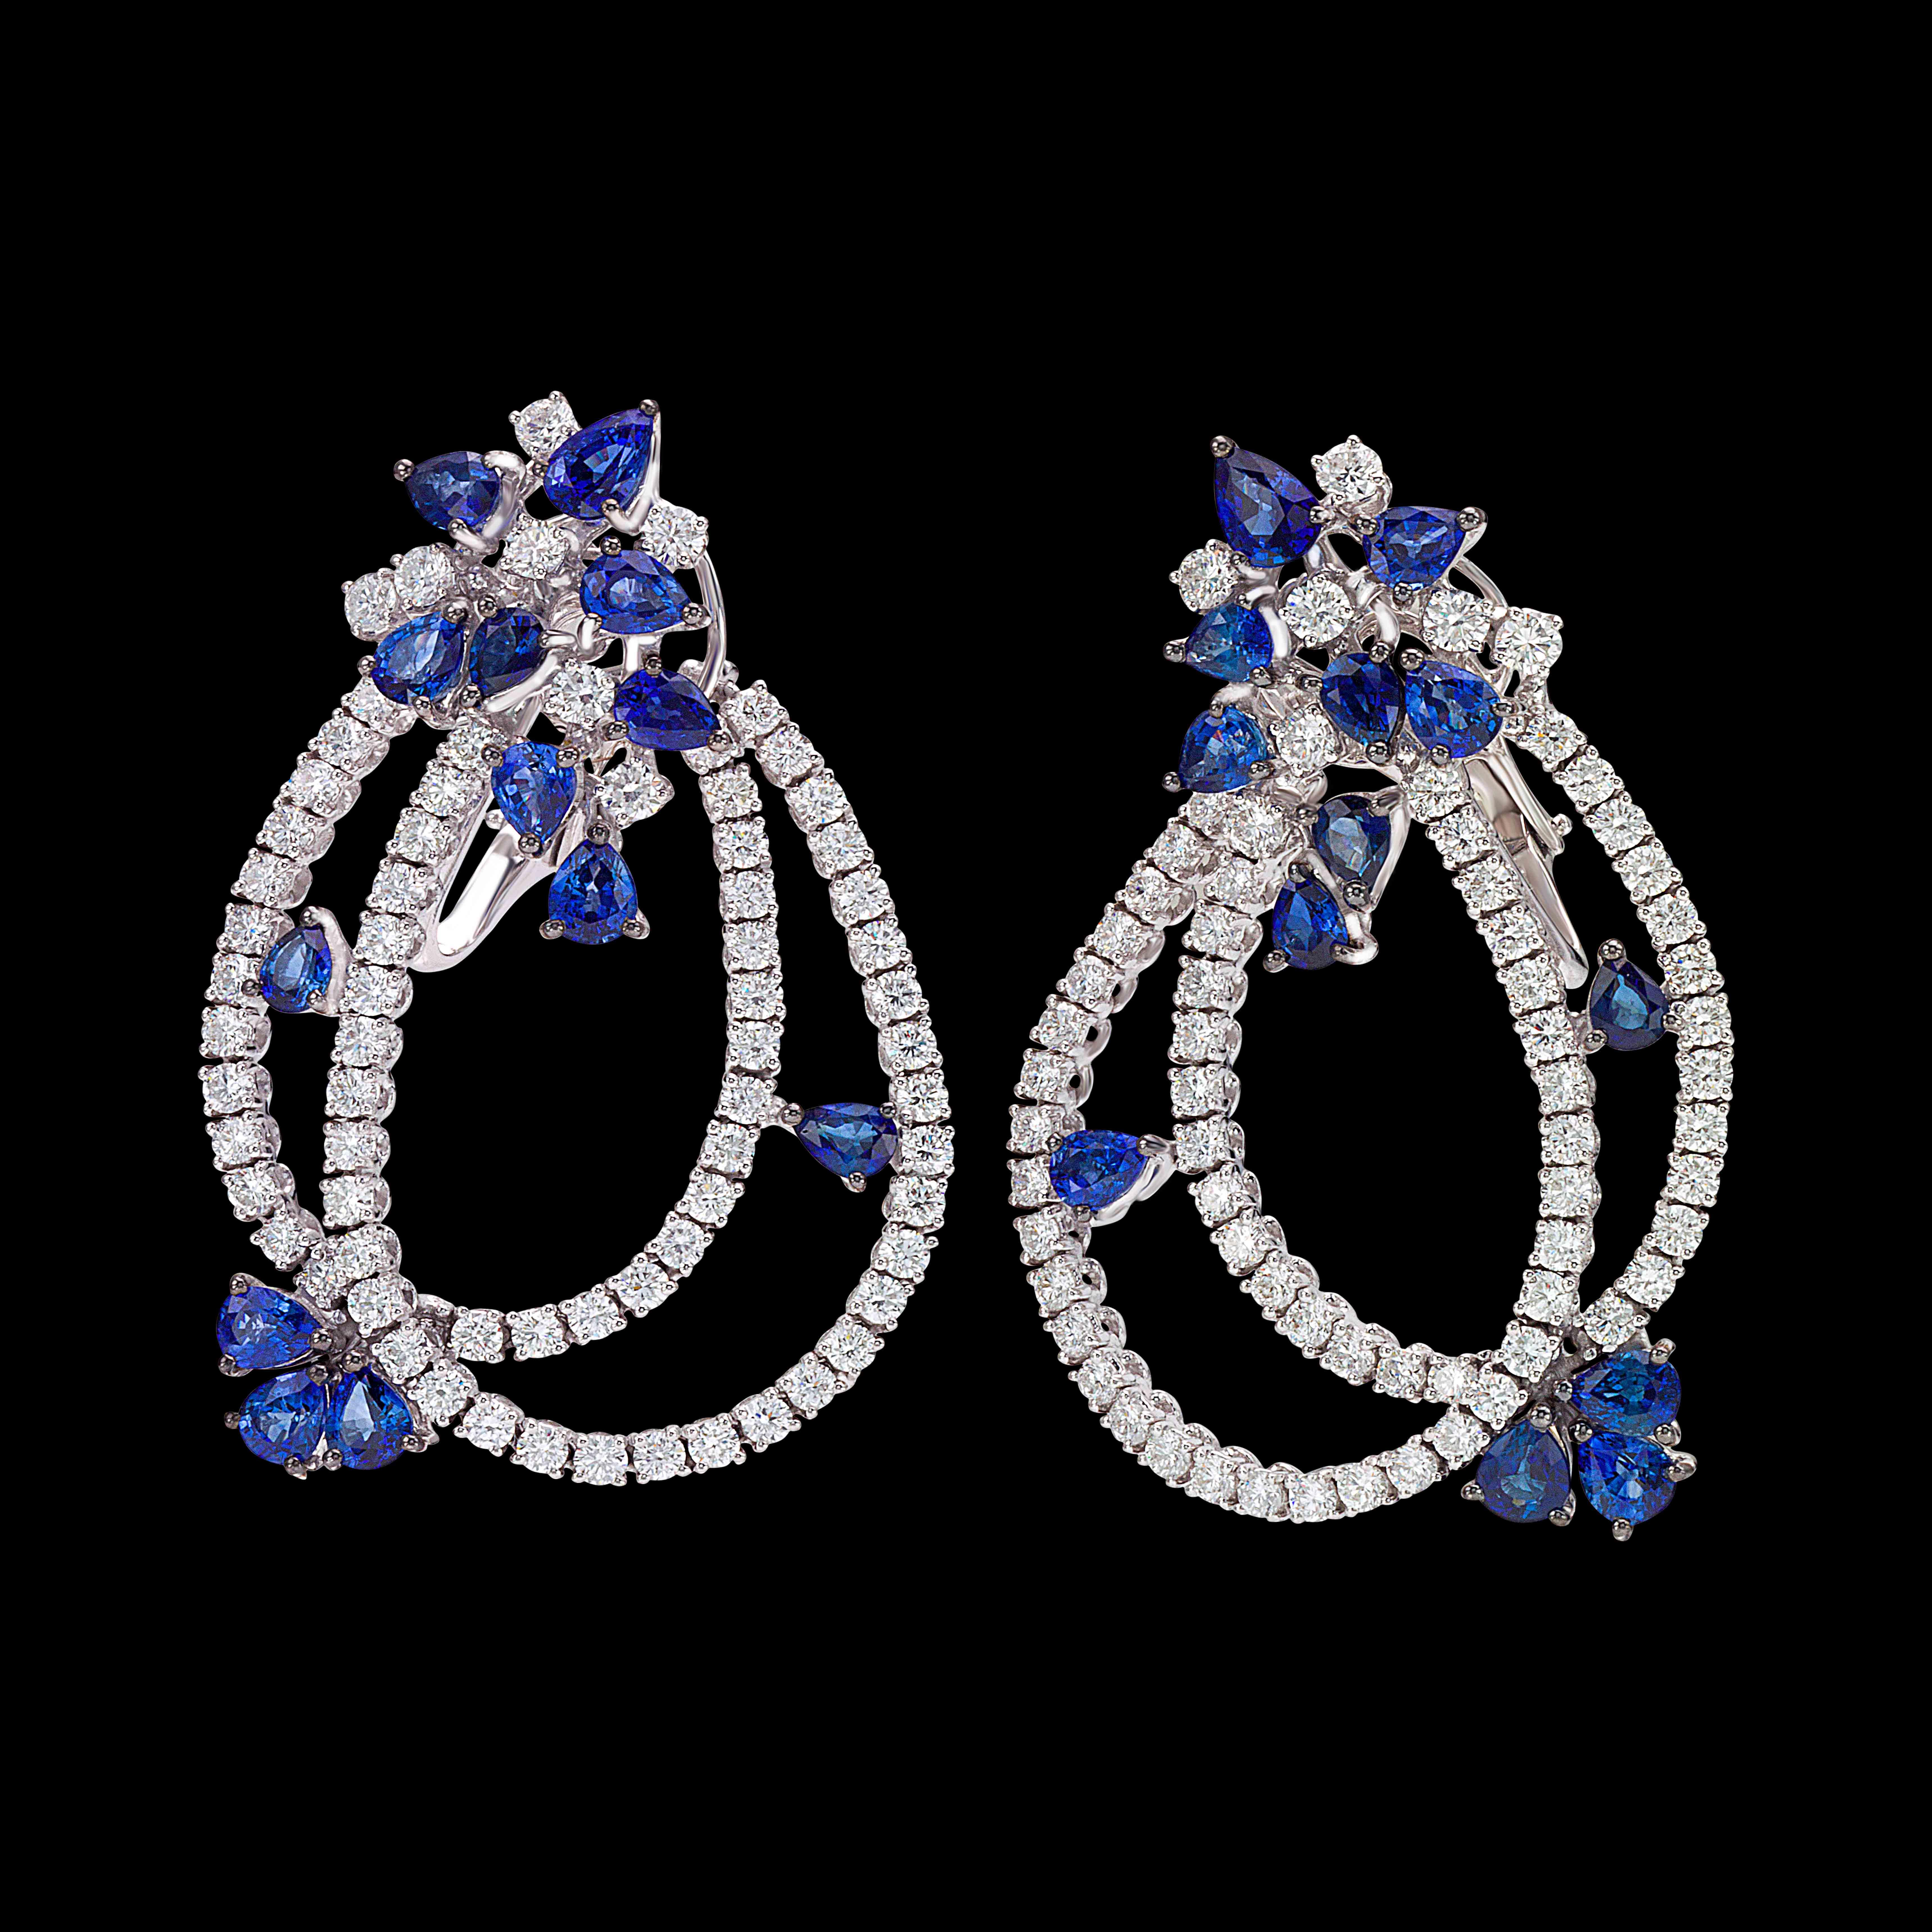 massimo raiteri exclusive jewellery gioielli diamond diamanti diamonds earring orecchini classic classici pear gocce blue blu sapphire zaffiri zaffiro